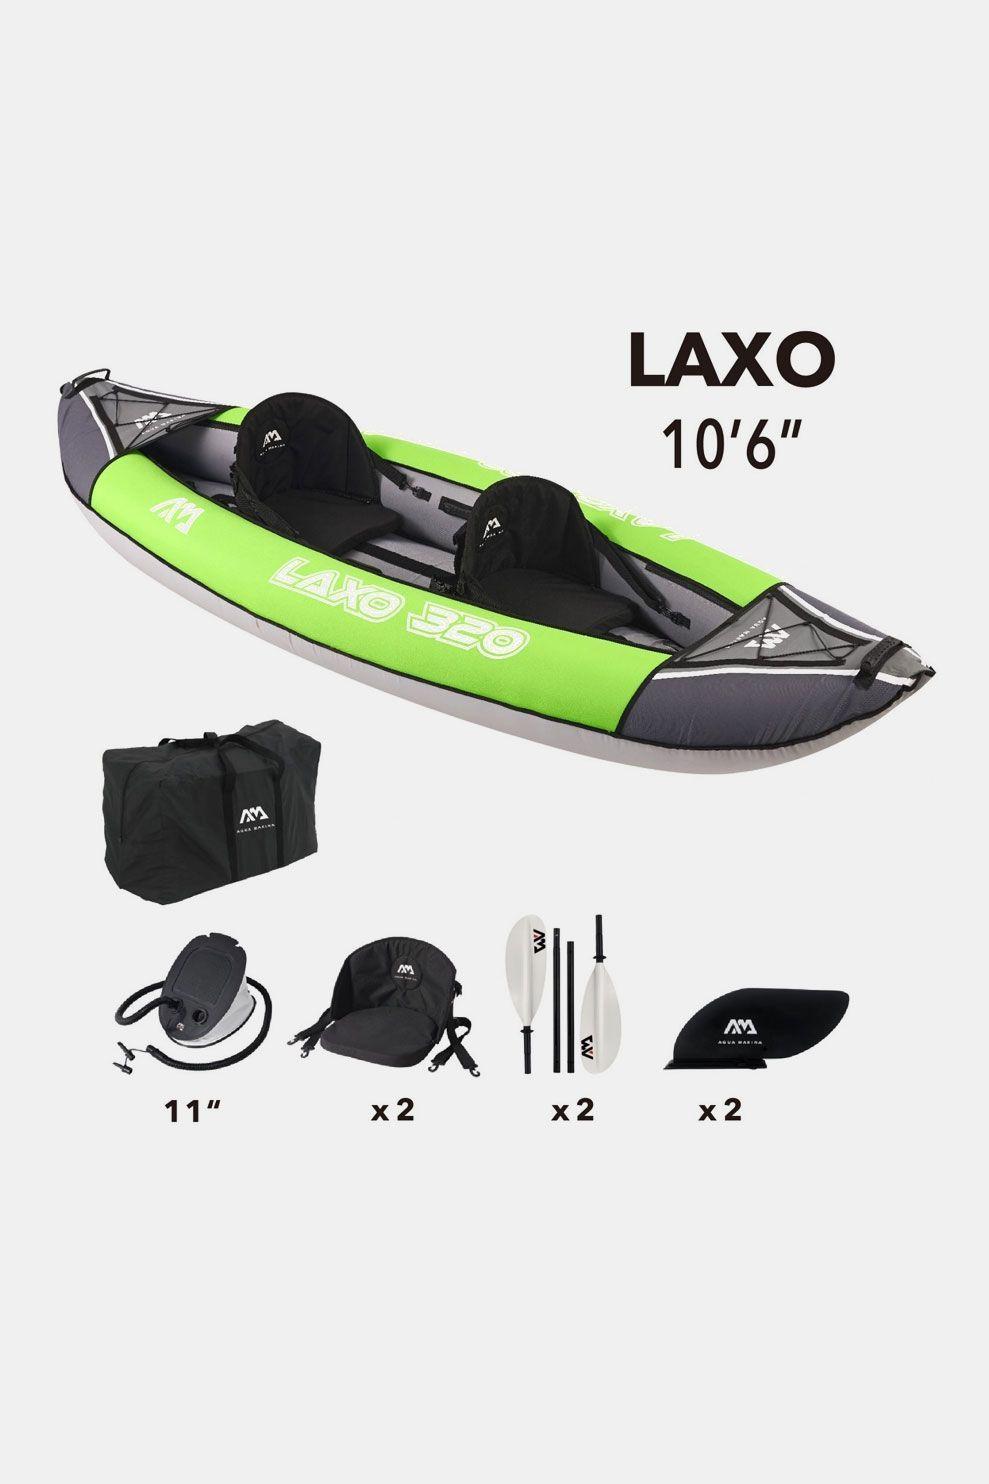 Aqua Marina Kayak Laxo 320 Middengrijs/Groen